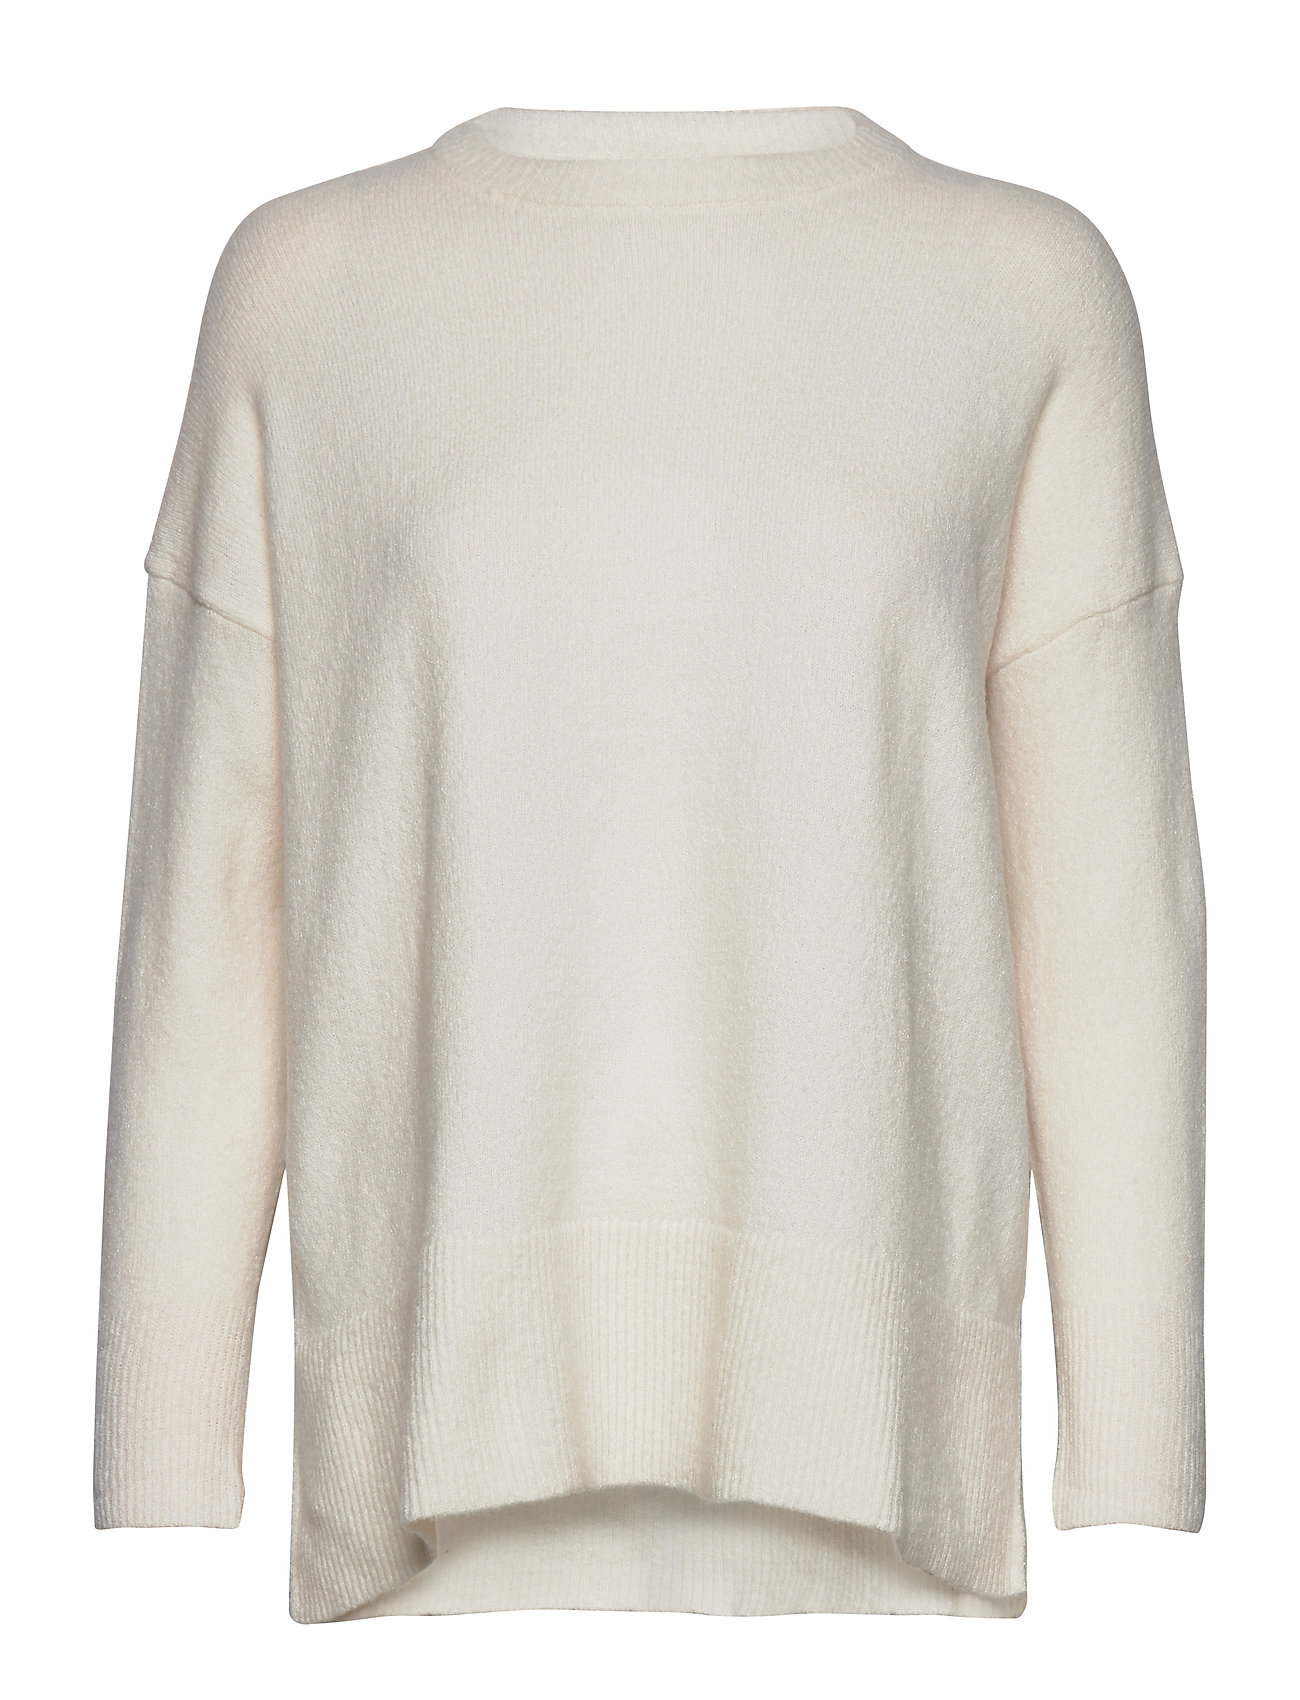 Mango Ribbed detail sweater - LIGHT BEIGE